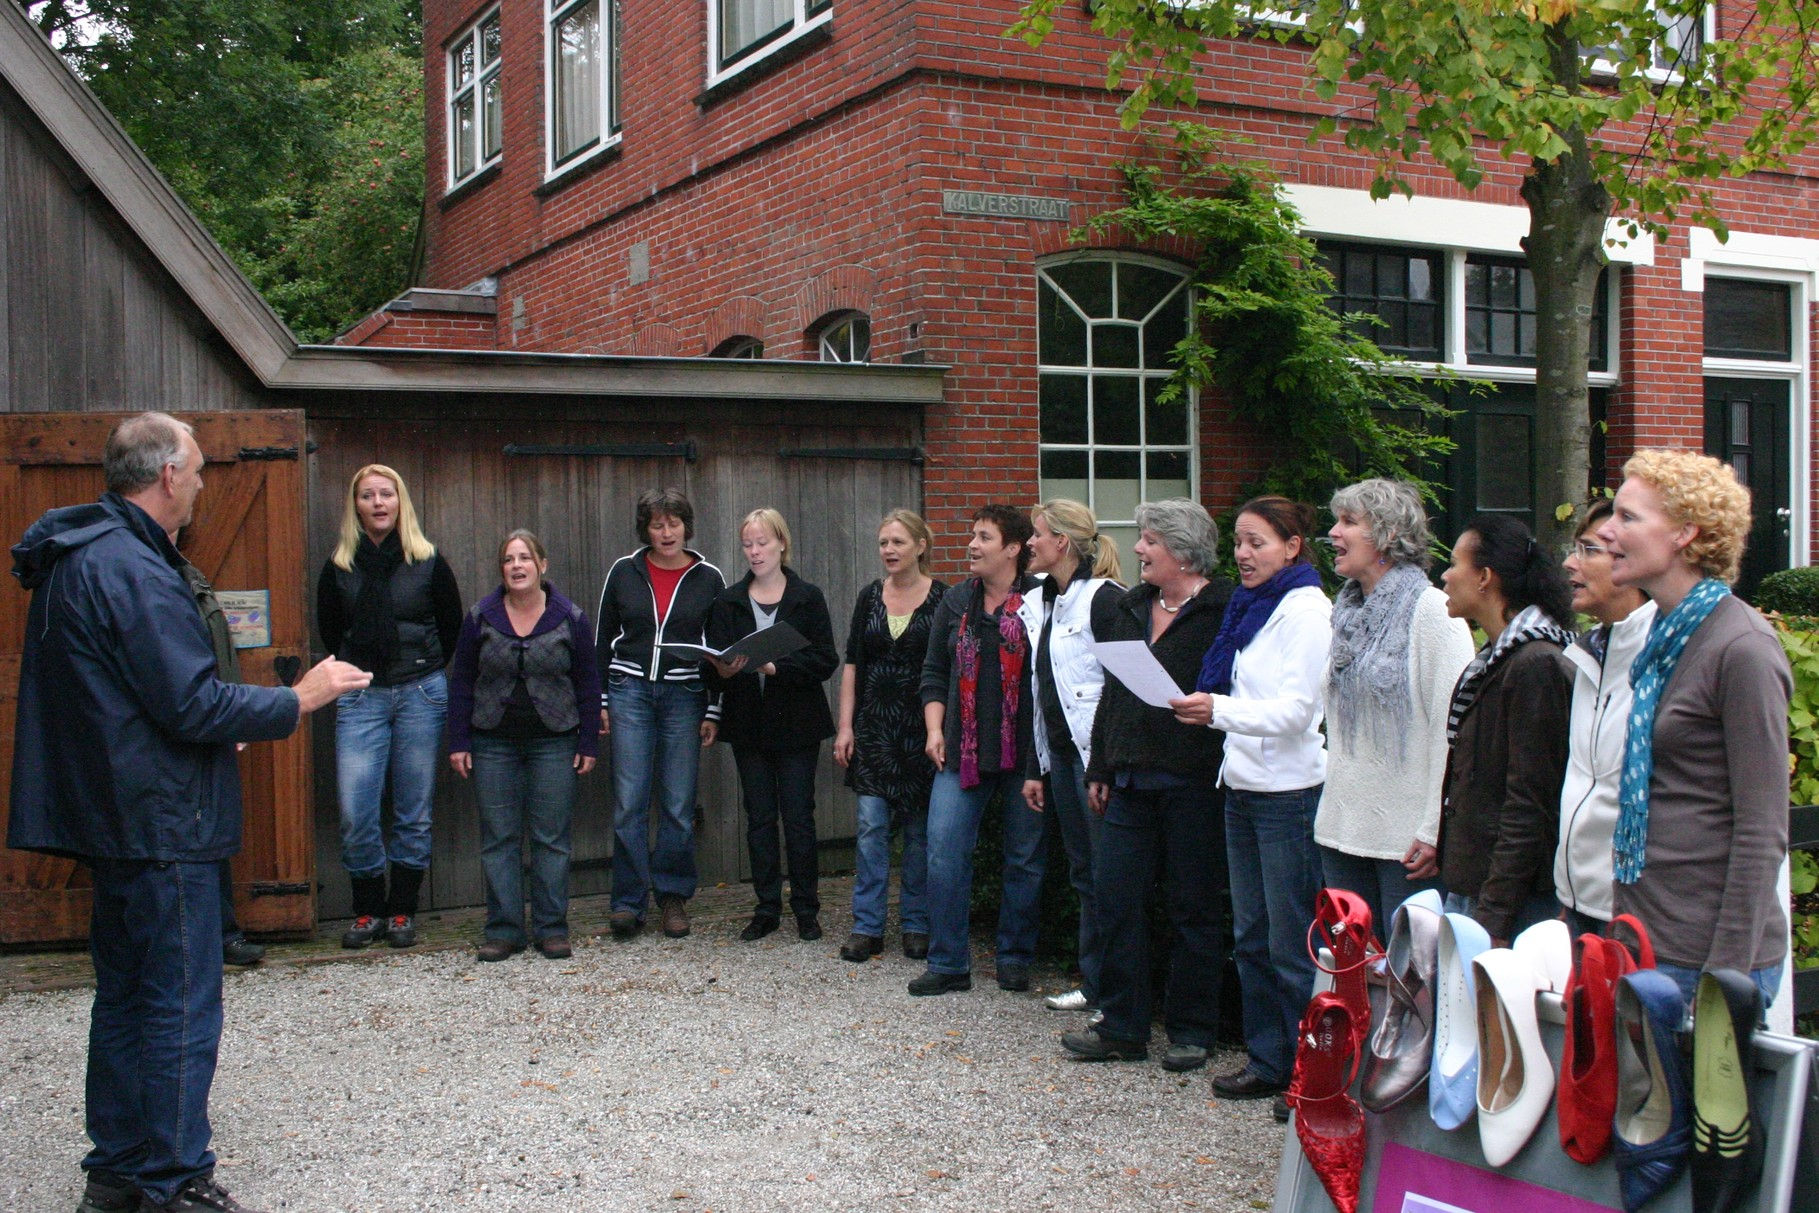 Tocht om de Noord, Warffum, september 2009